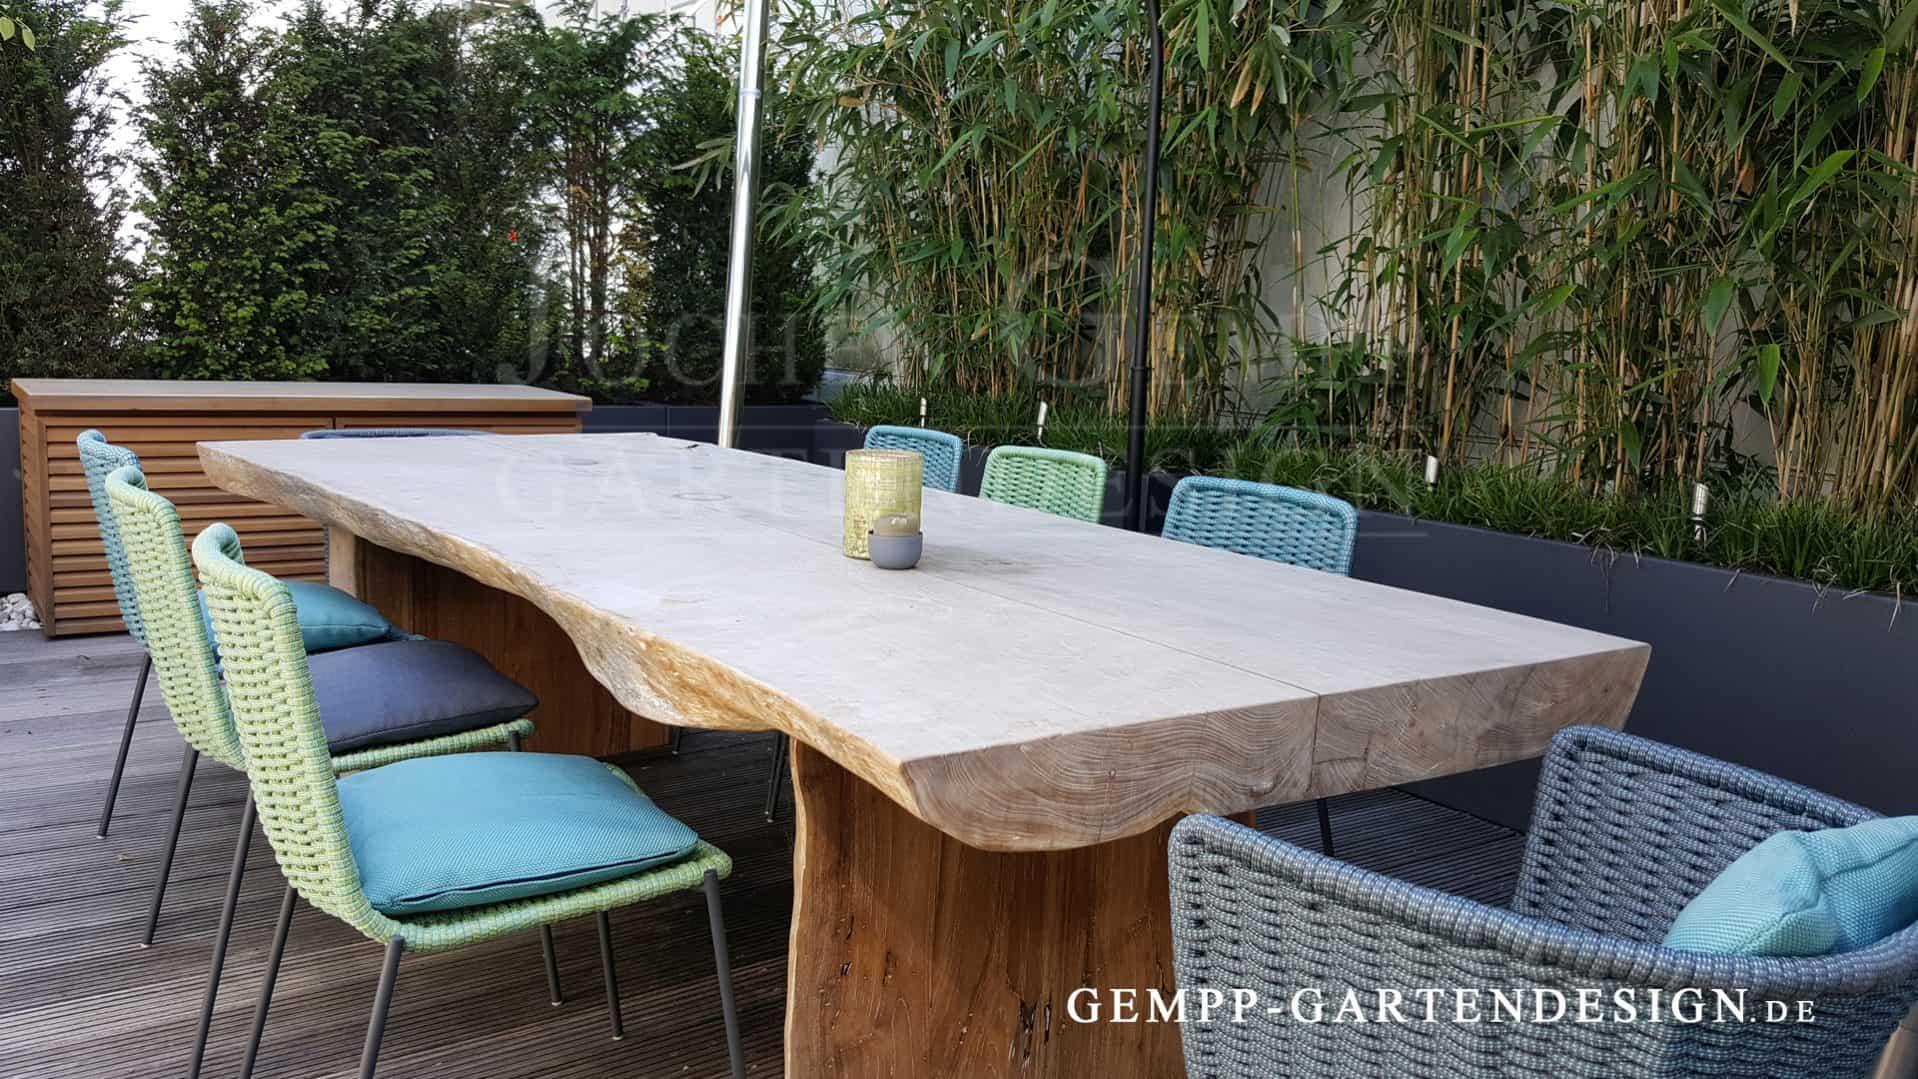 Gartenmobel Gempp Gartendesign Designmobel